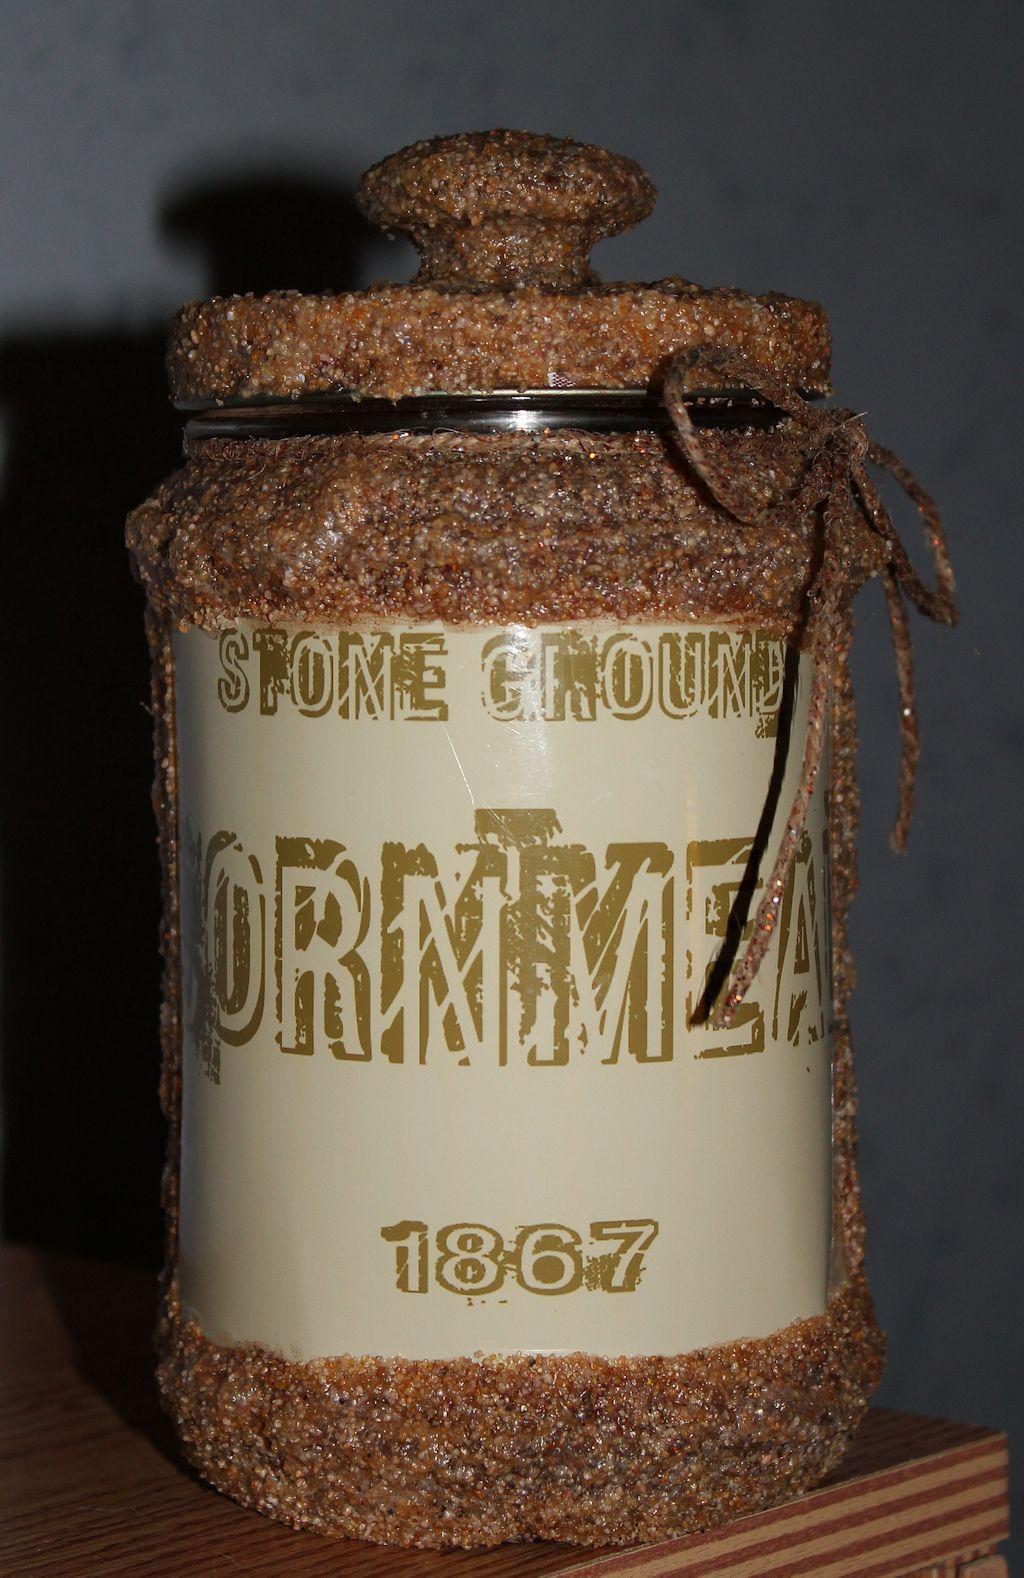 Smuckers Peanut Butter Jar | My Primitive Crafts | Pinterest